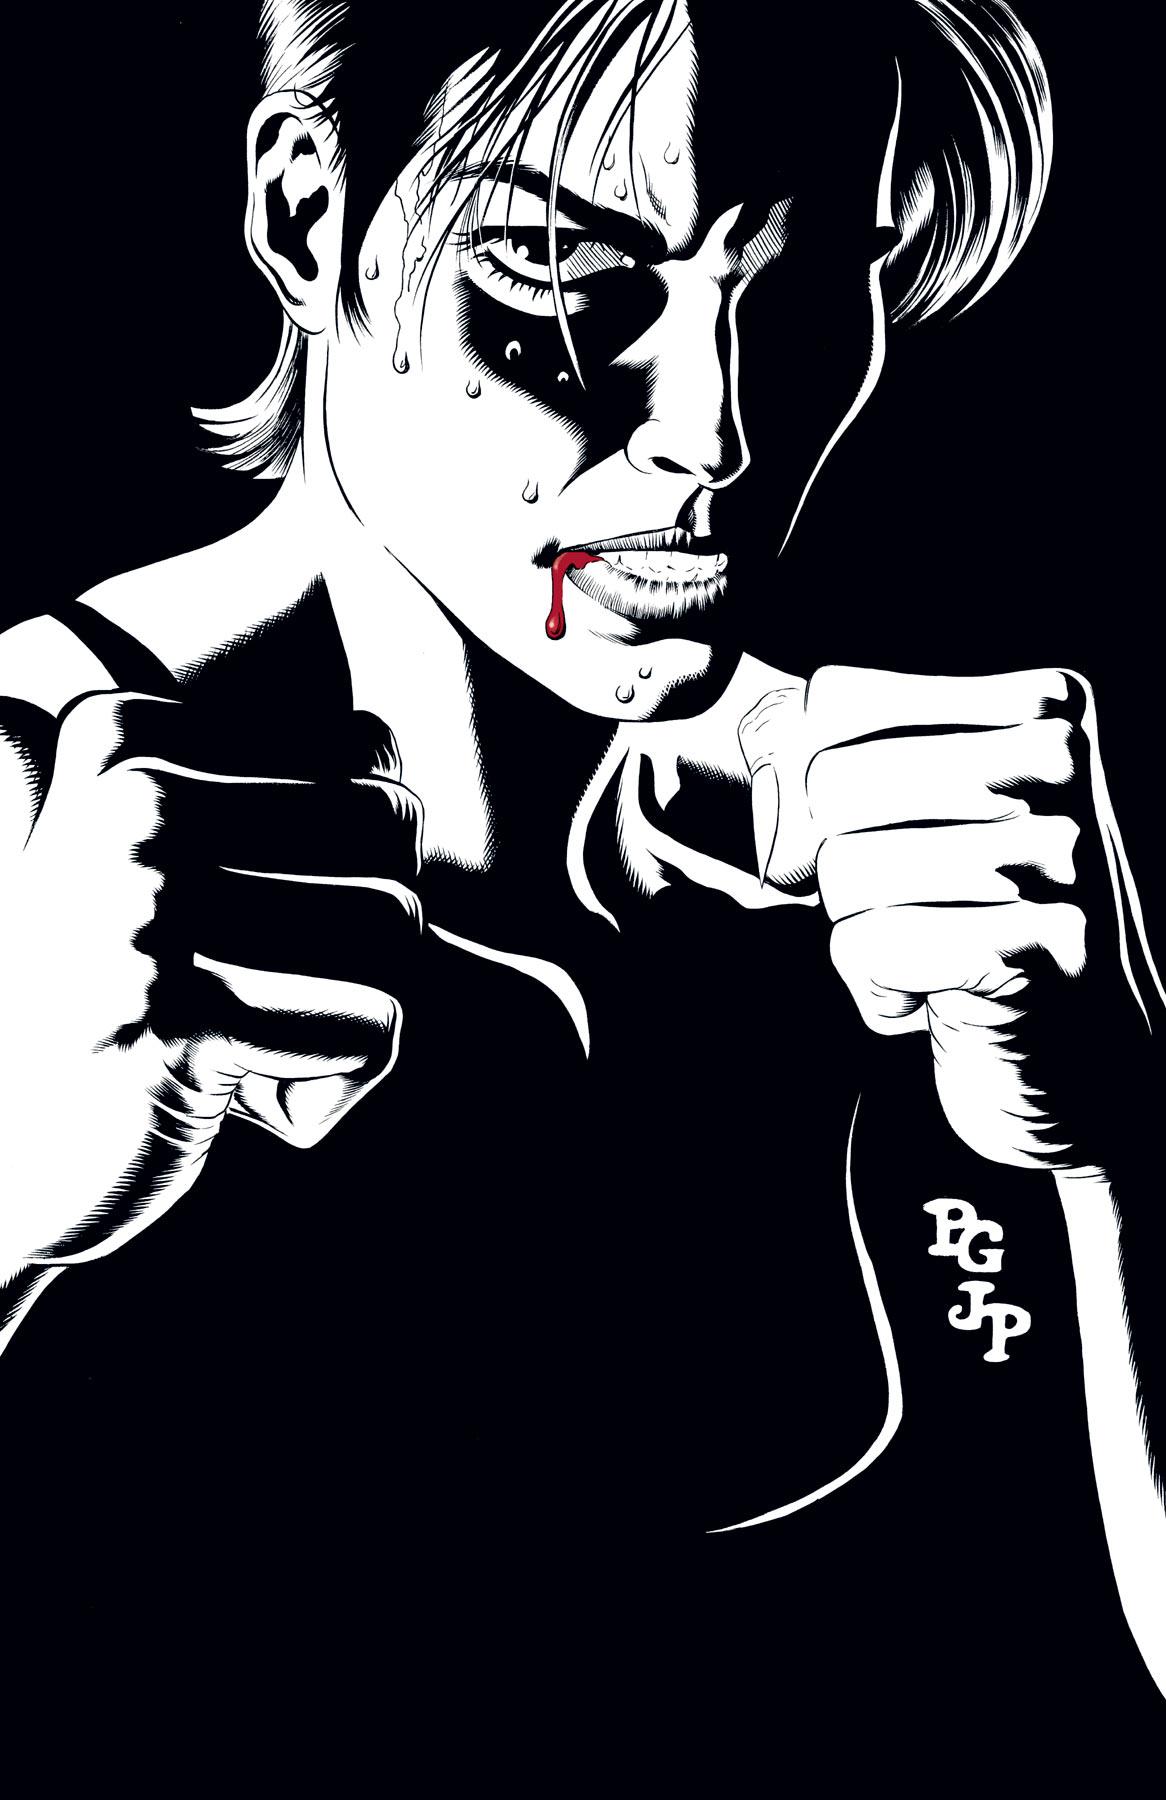 Catwoman Vol 3 29 Textless.jpg